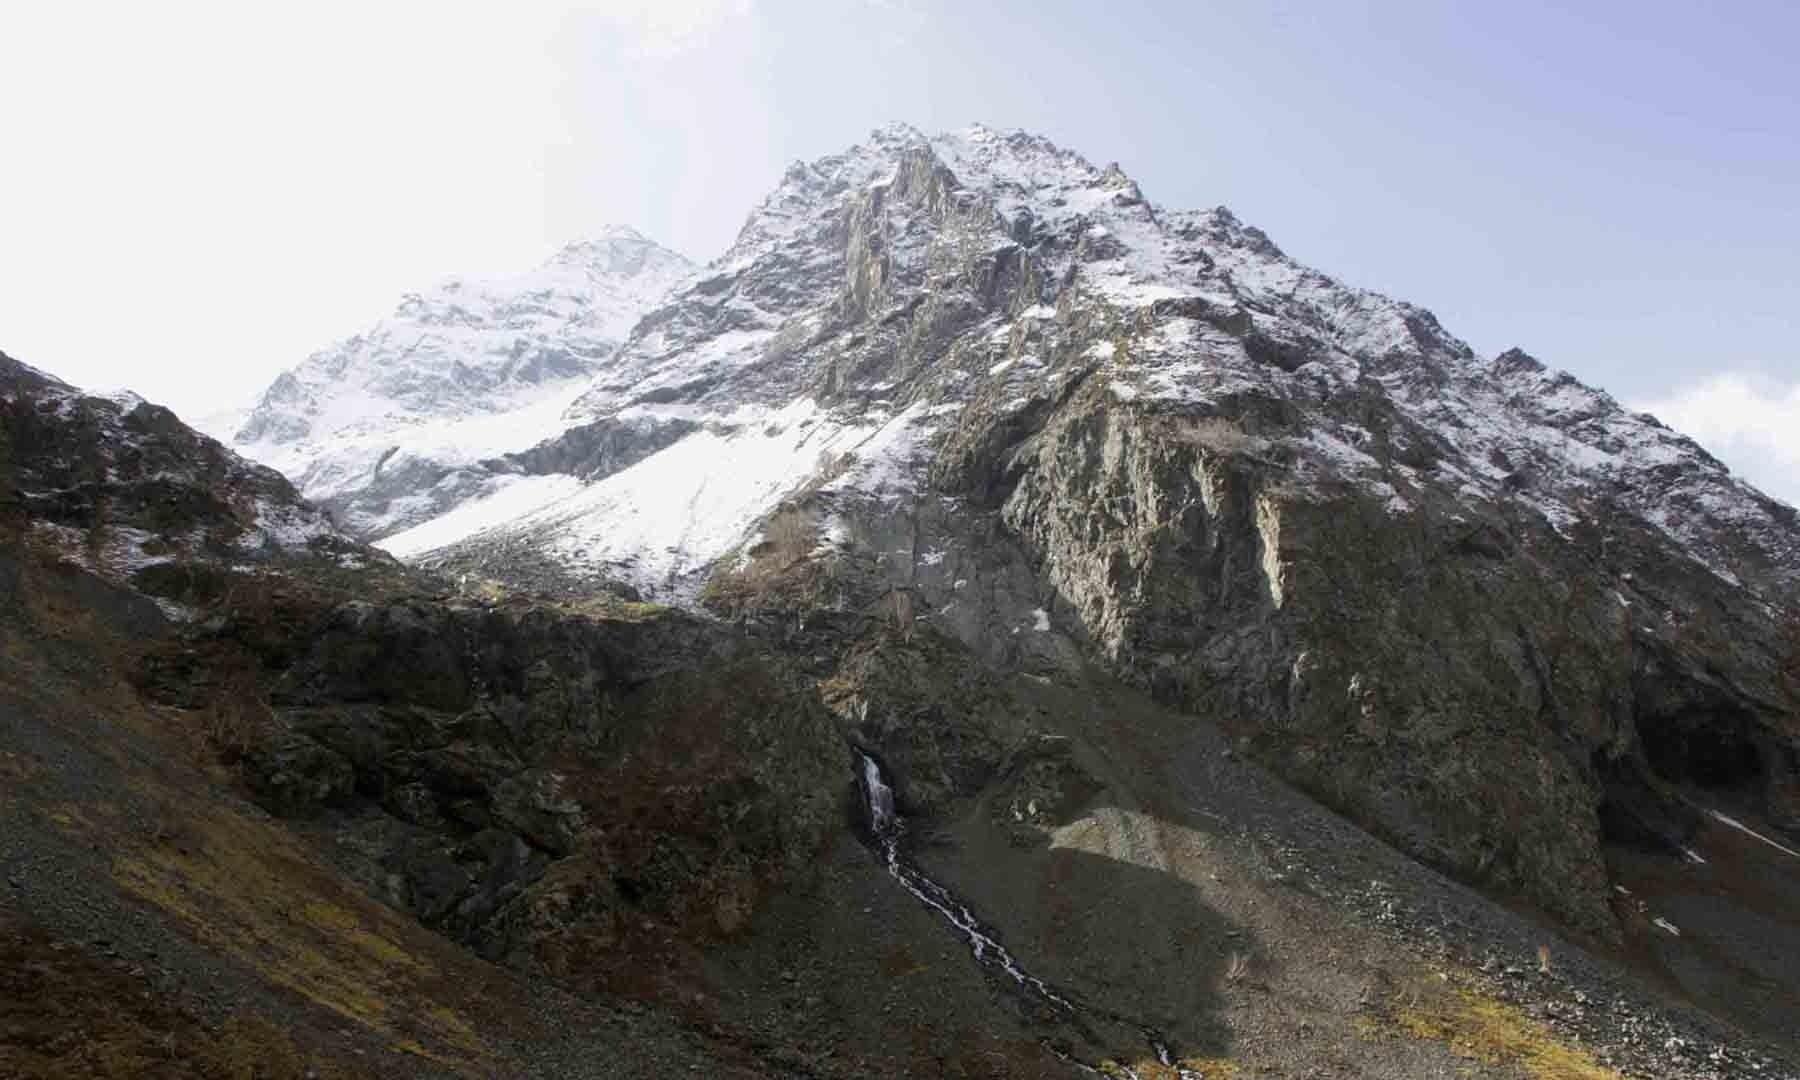 سوات کی غیر معروف بلند ترین چوٹی 'فلک سیر' کی سیر